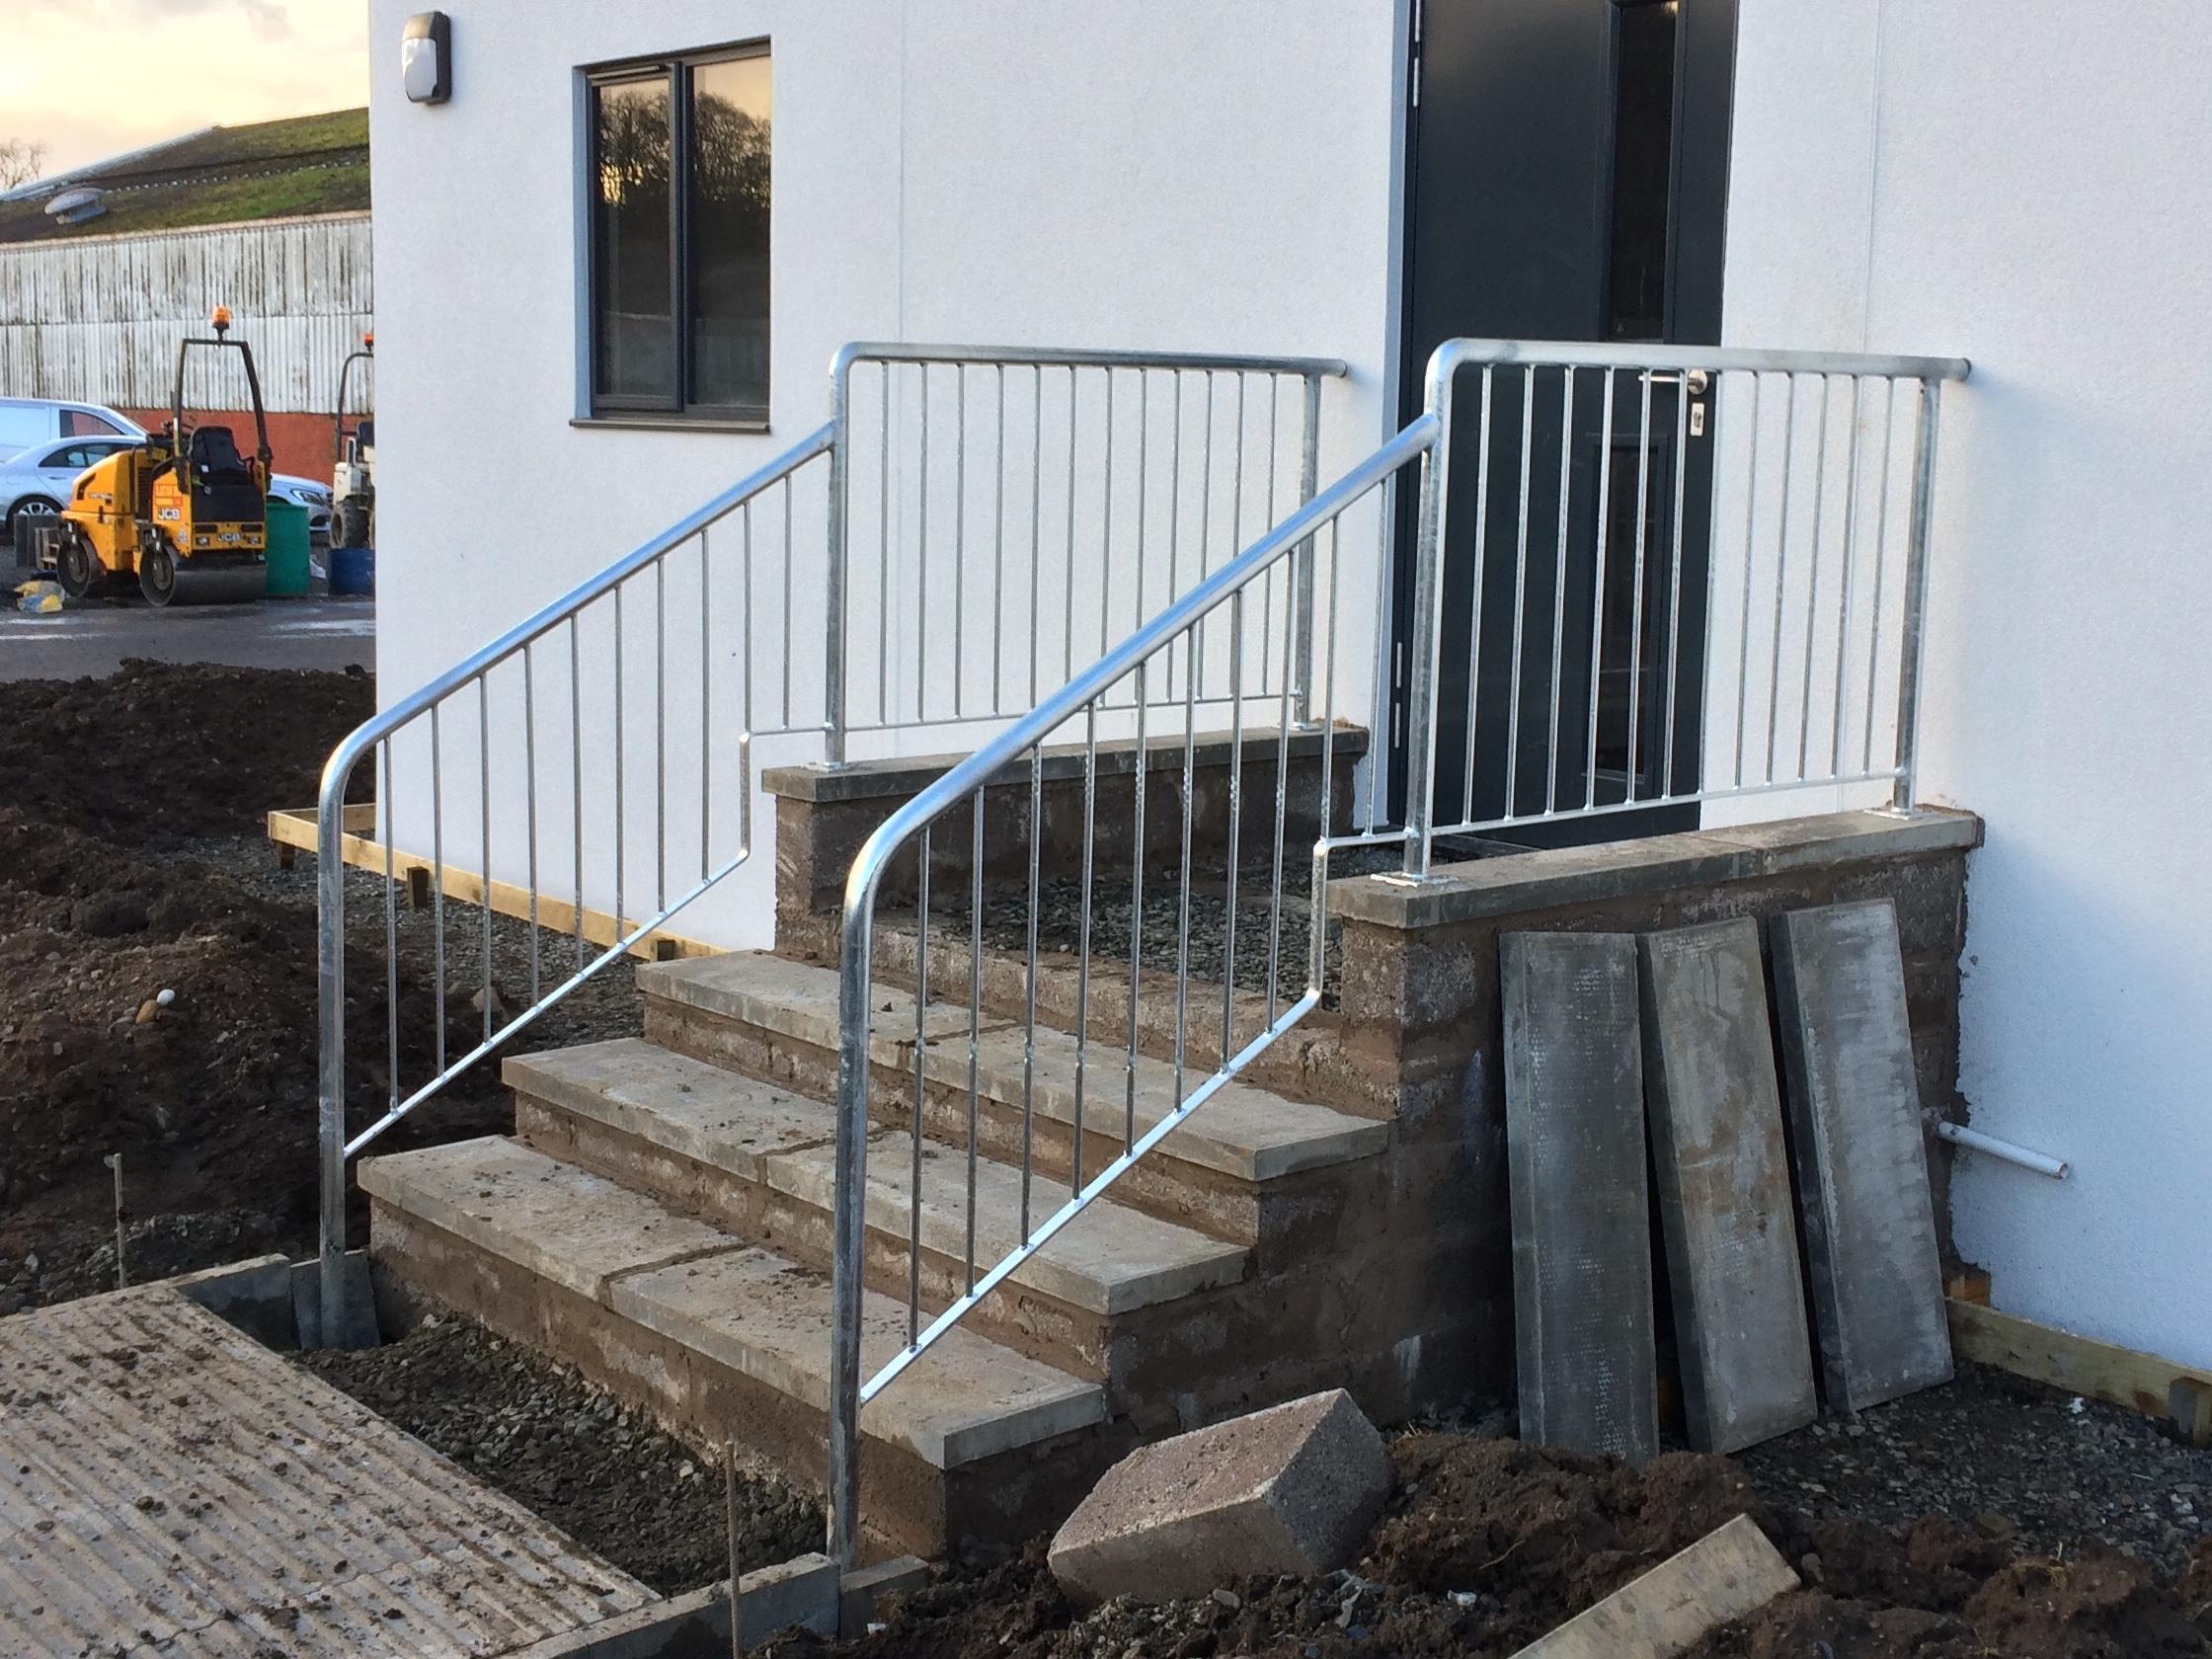 Commercial tubular metal access handrail by Dain Art Iron